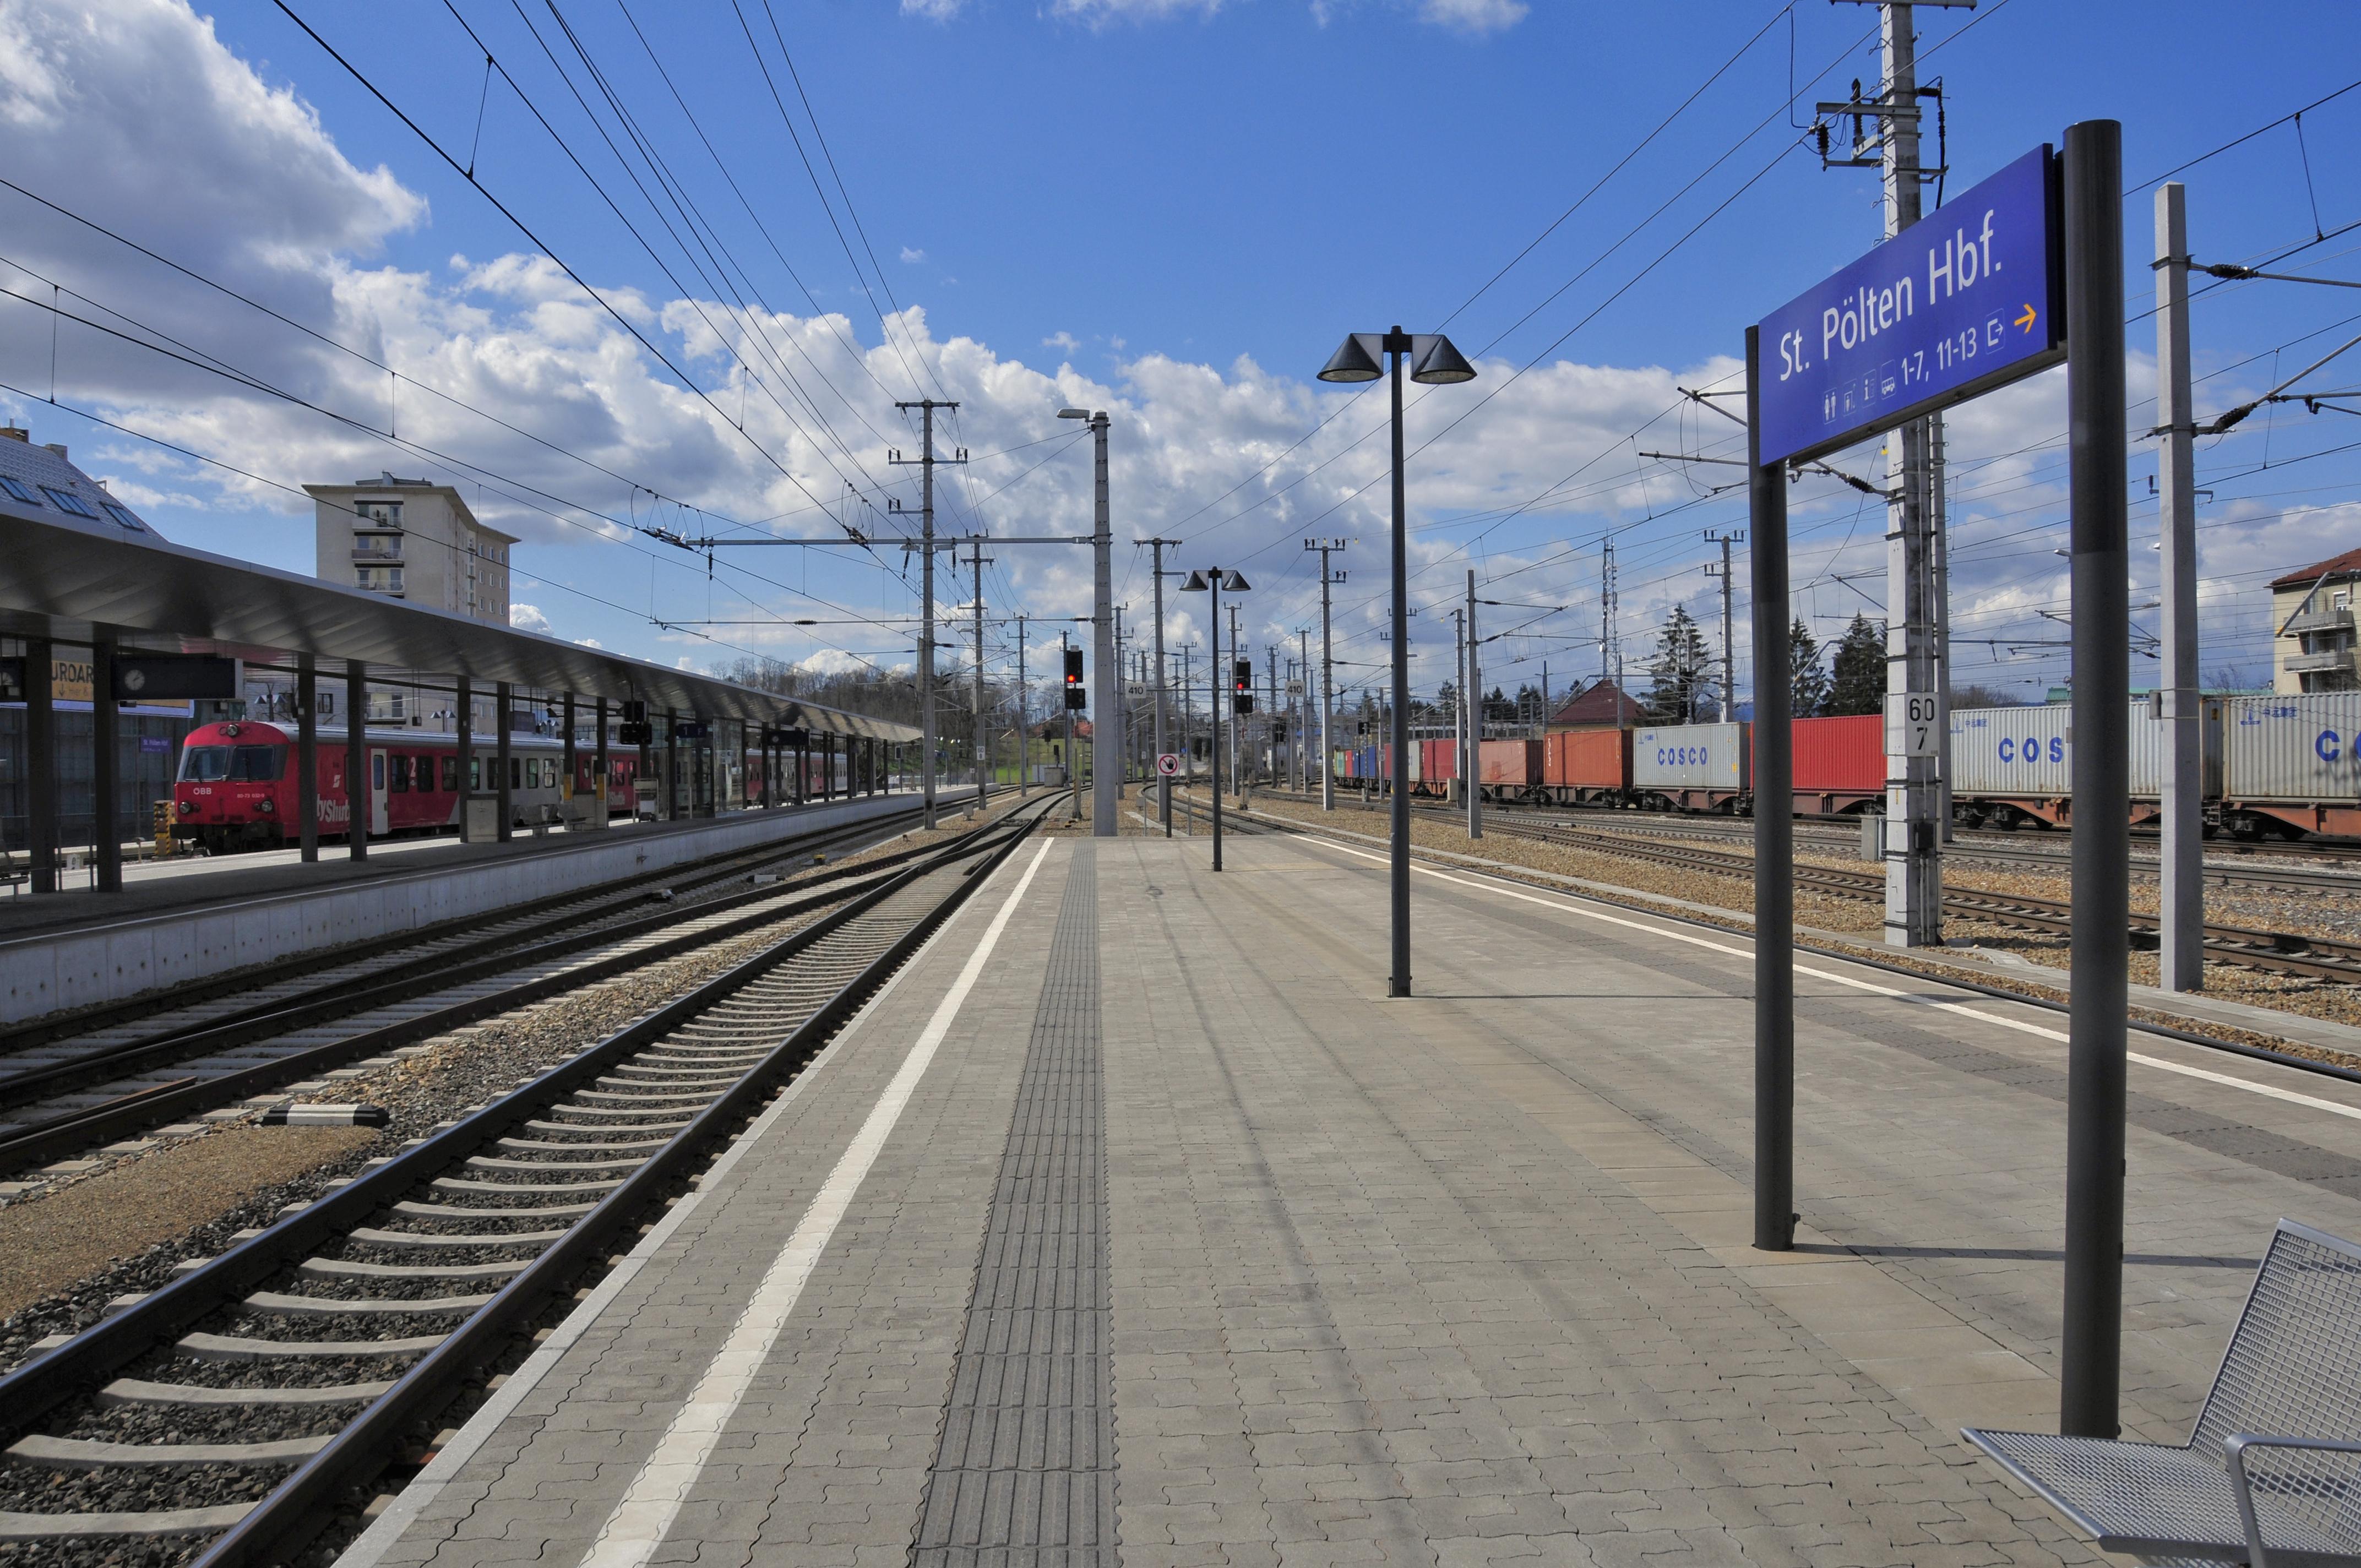 File 13 04 13 St Poelten Bahnhof 252 Jpg Wikimedia Commons